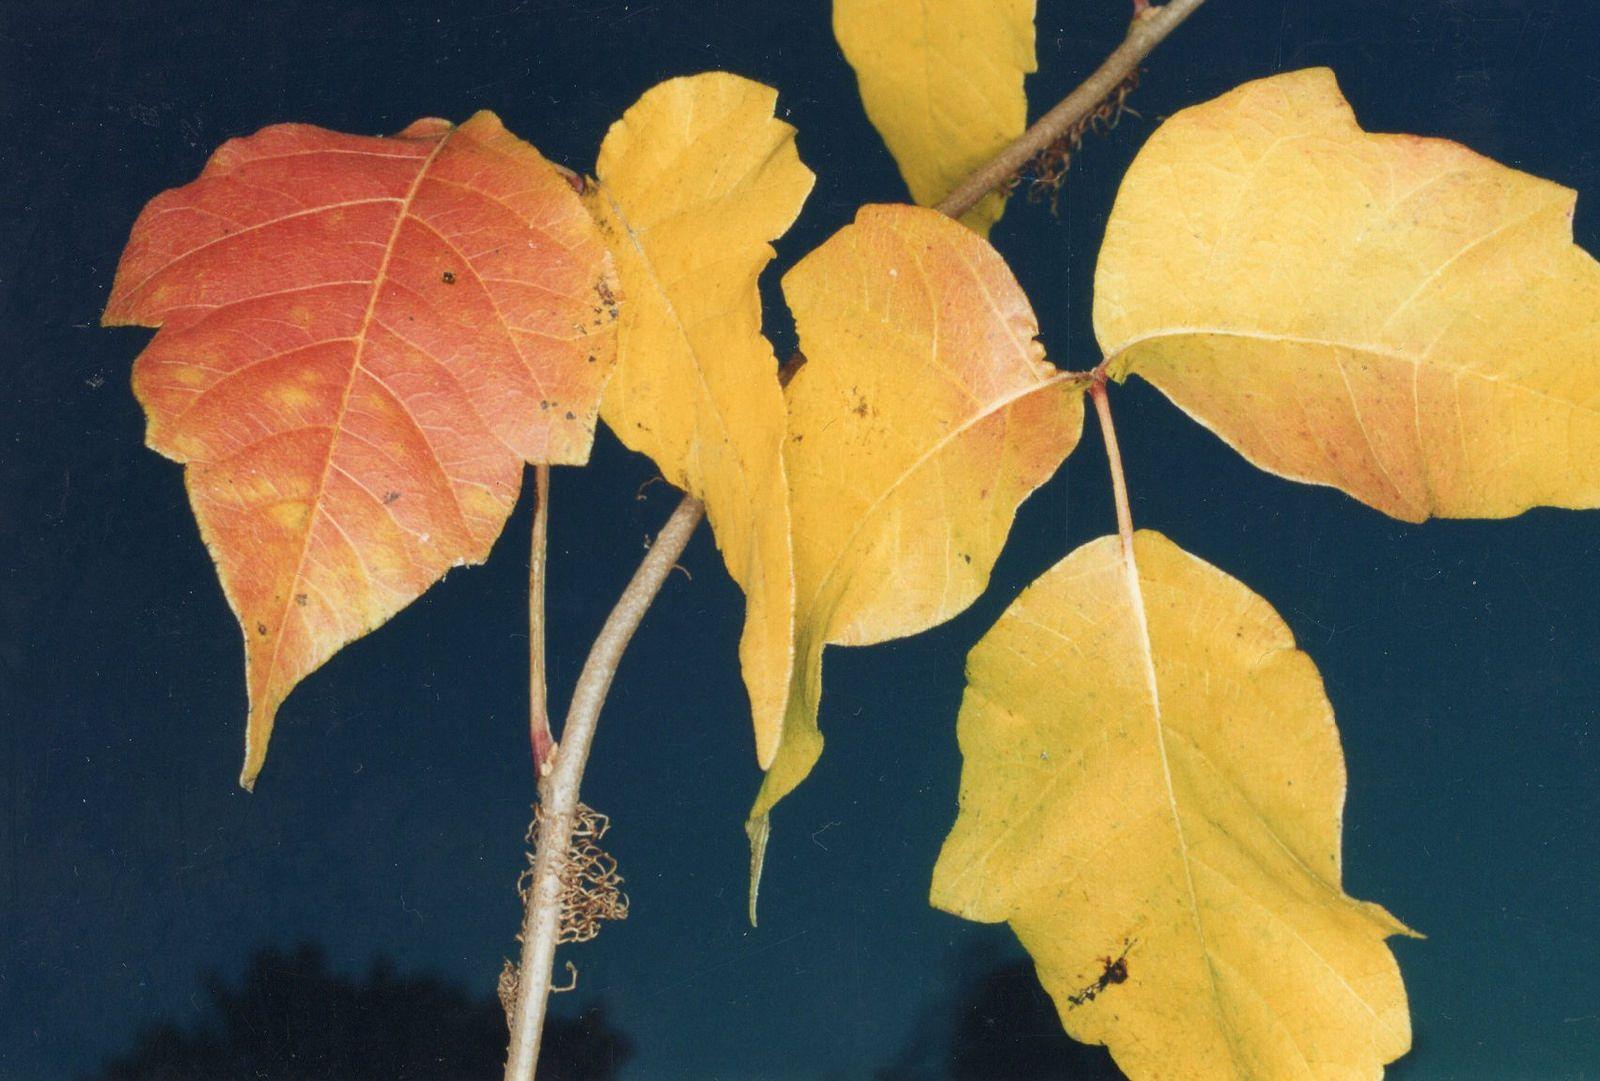 https://flic.kr/p/LZtuAf | Poison ivy in the autumn | 최신 최고로 좋은 실용적 육아 정보 소아 청소년…